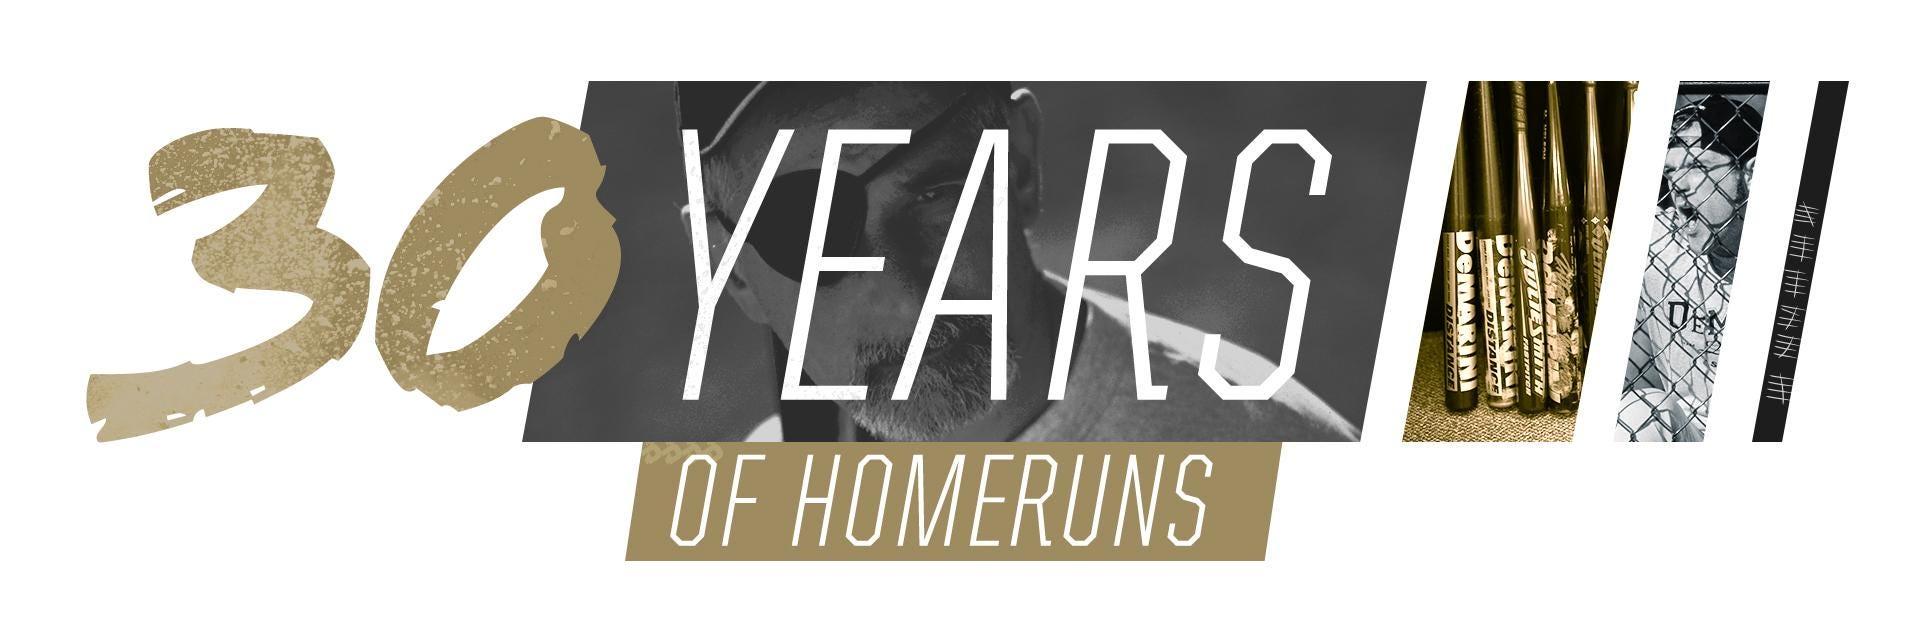 30 years of homeruns with DeMarini Bats